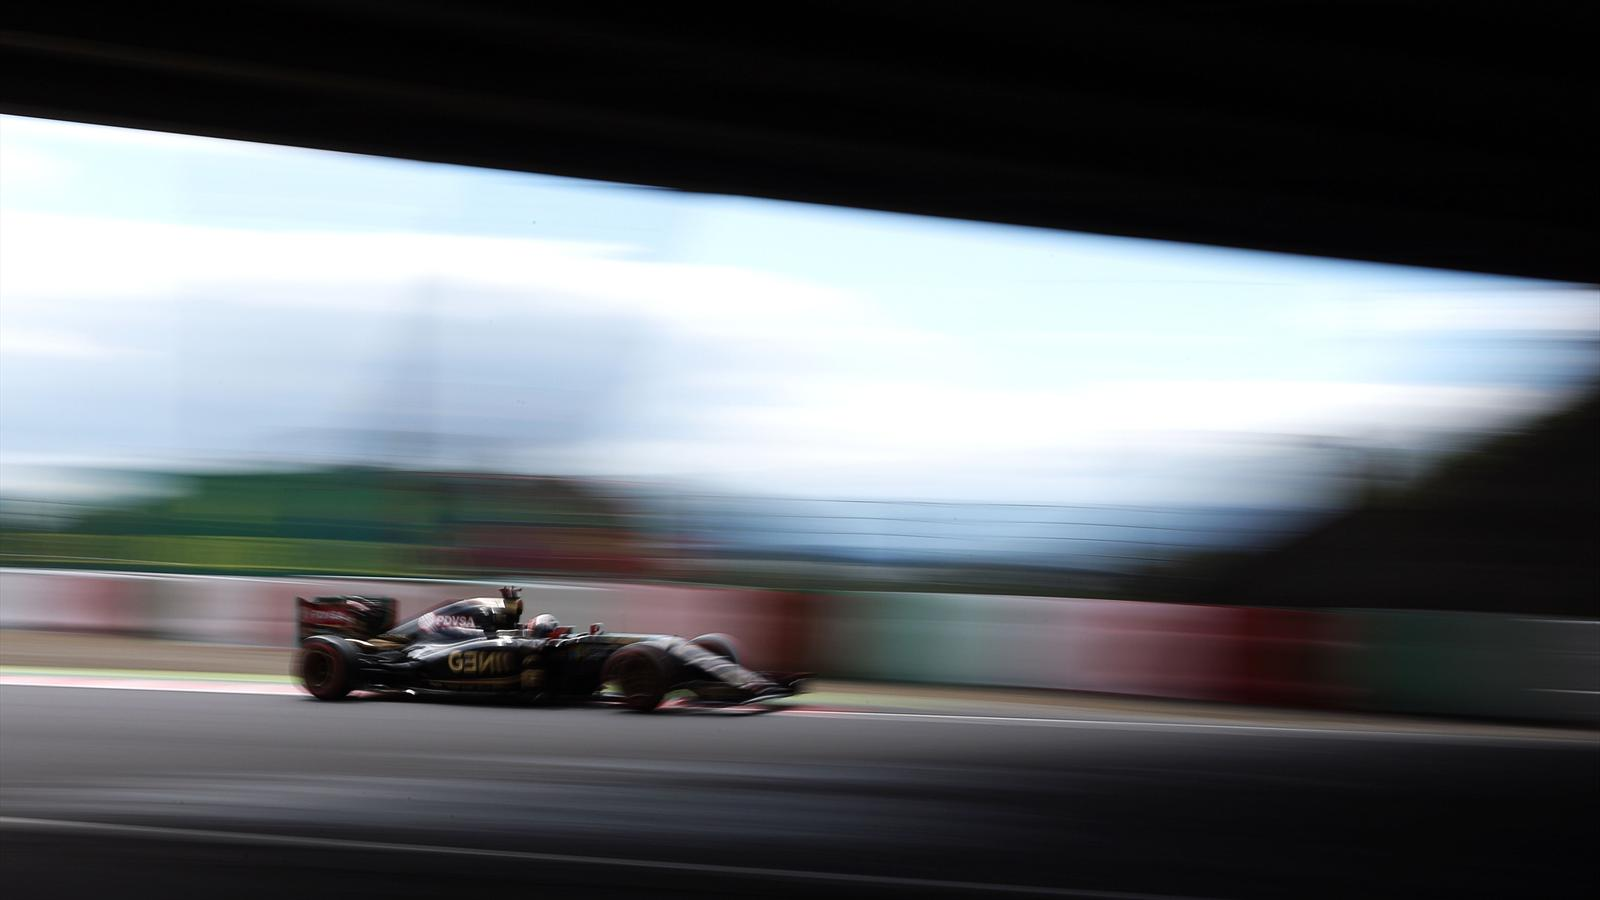 Romain Grosjean (Lotus) au Grand Prix du Japon 2015